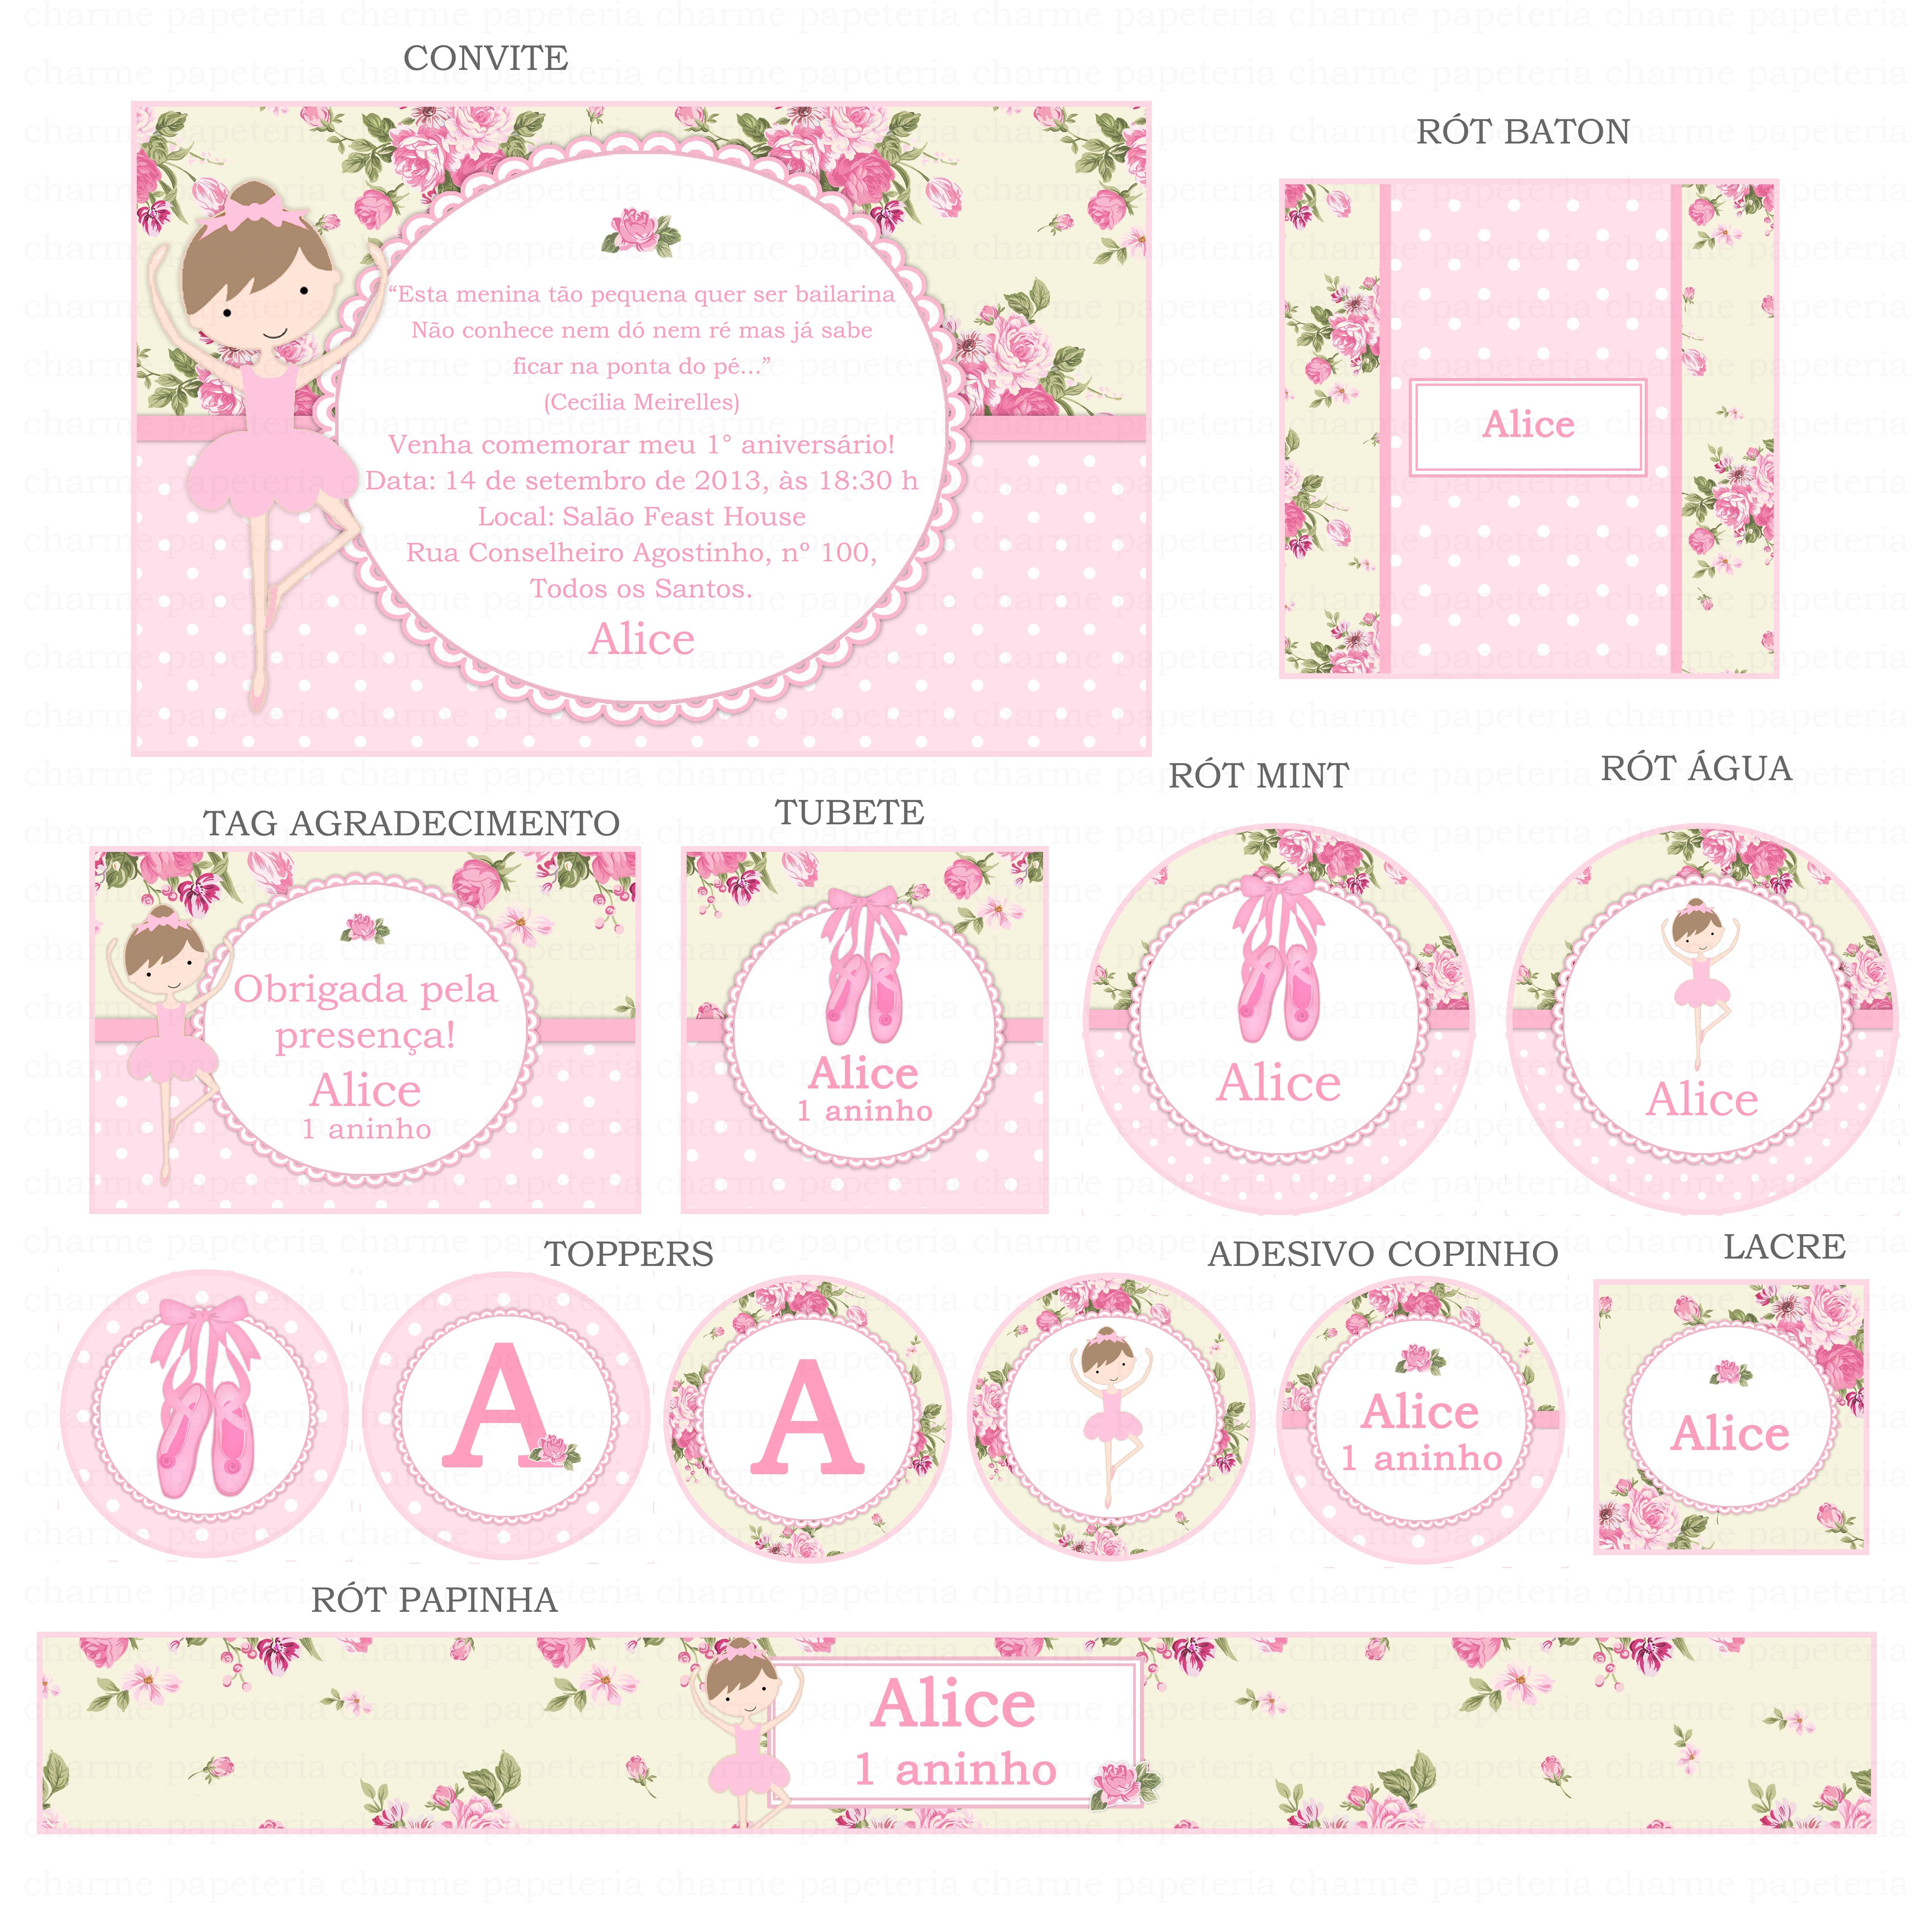 Kit digital rosa e bege bailarina Charme Papeteria Elo7 #B11A55 6300x6300 Banheiro Bege E Rosa